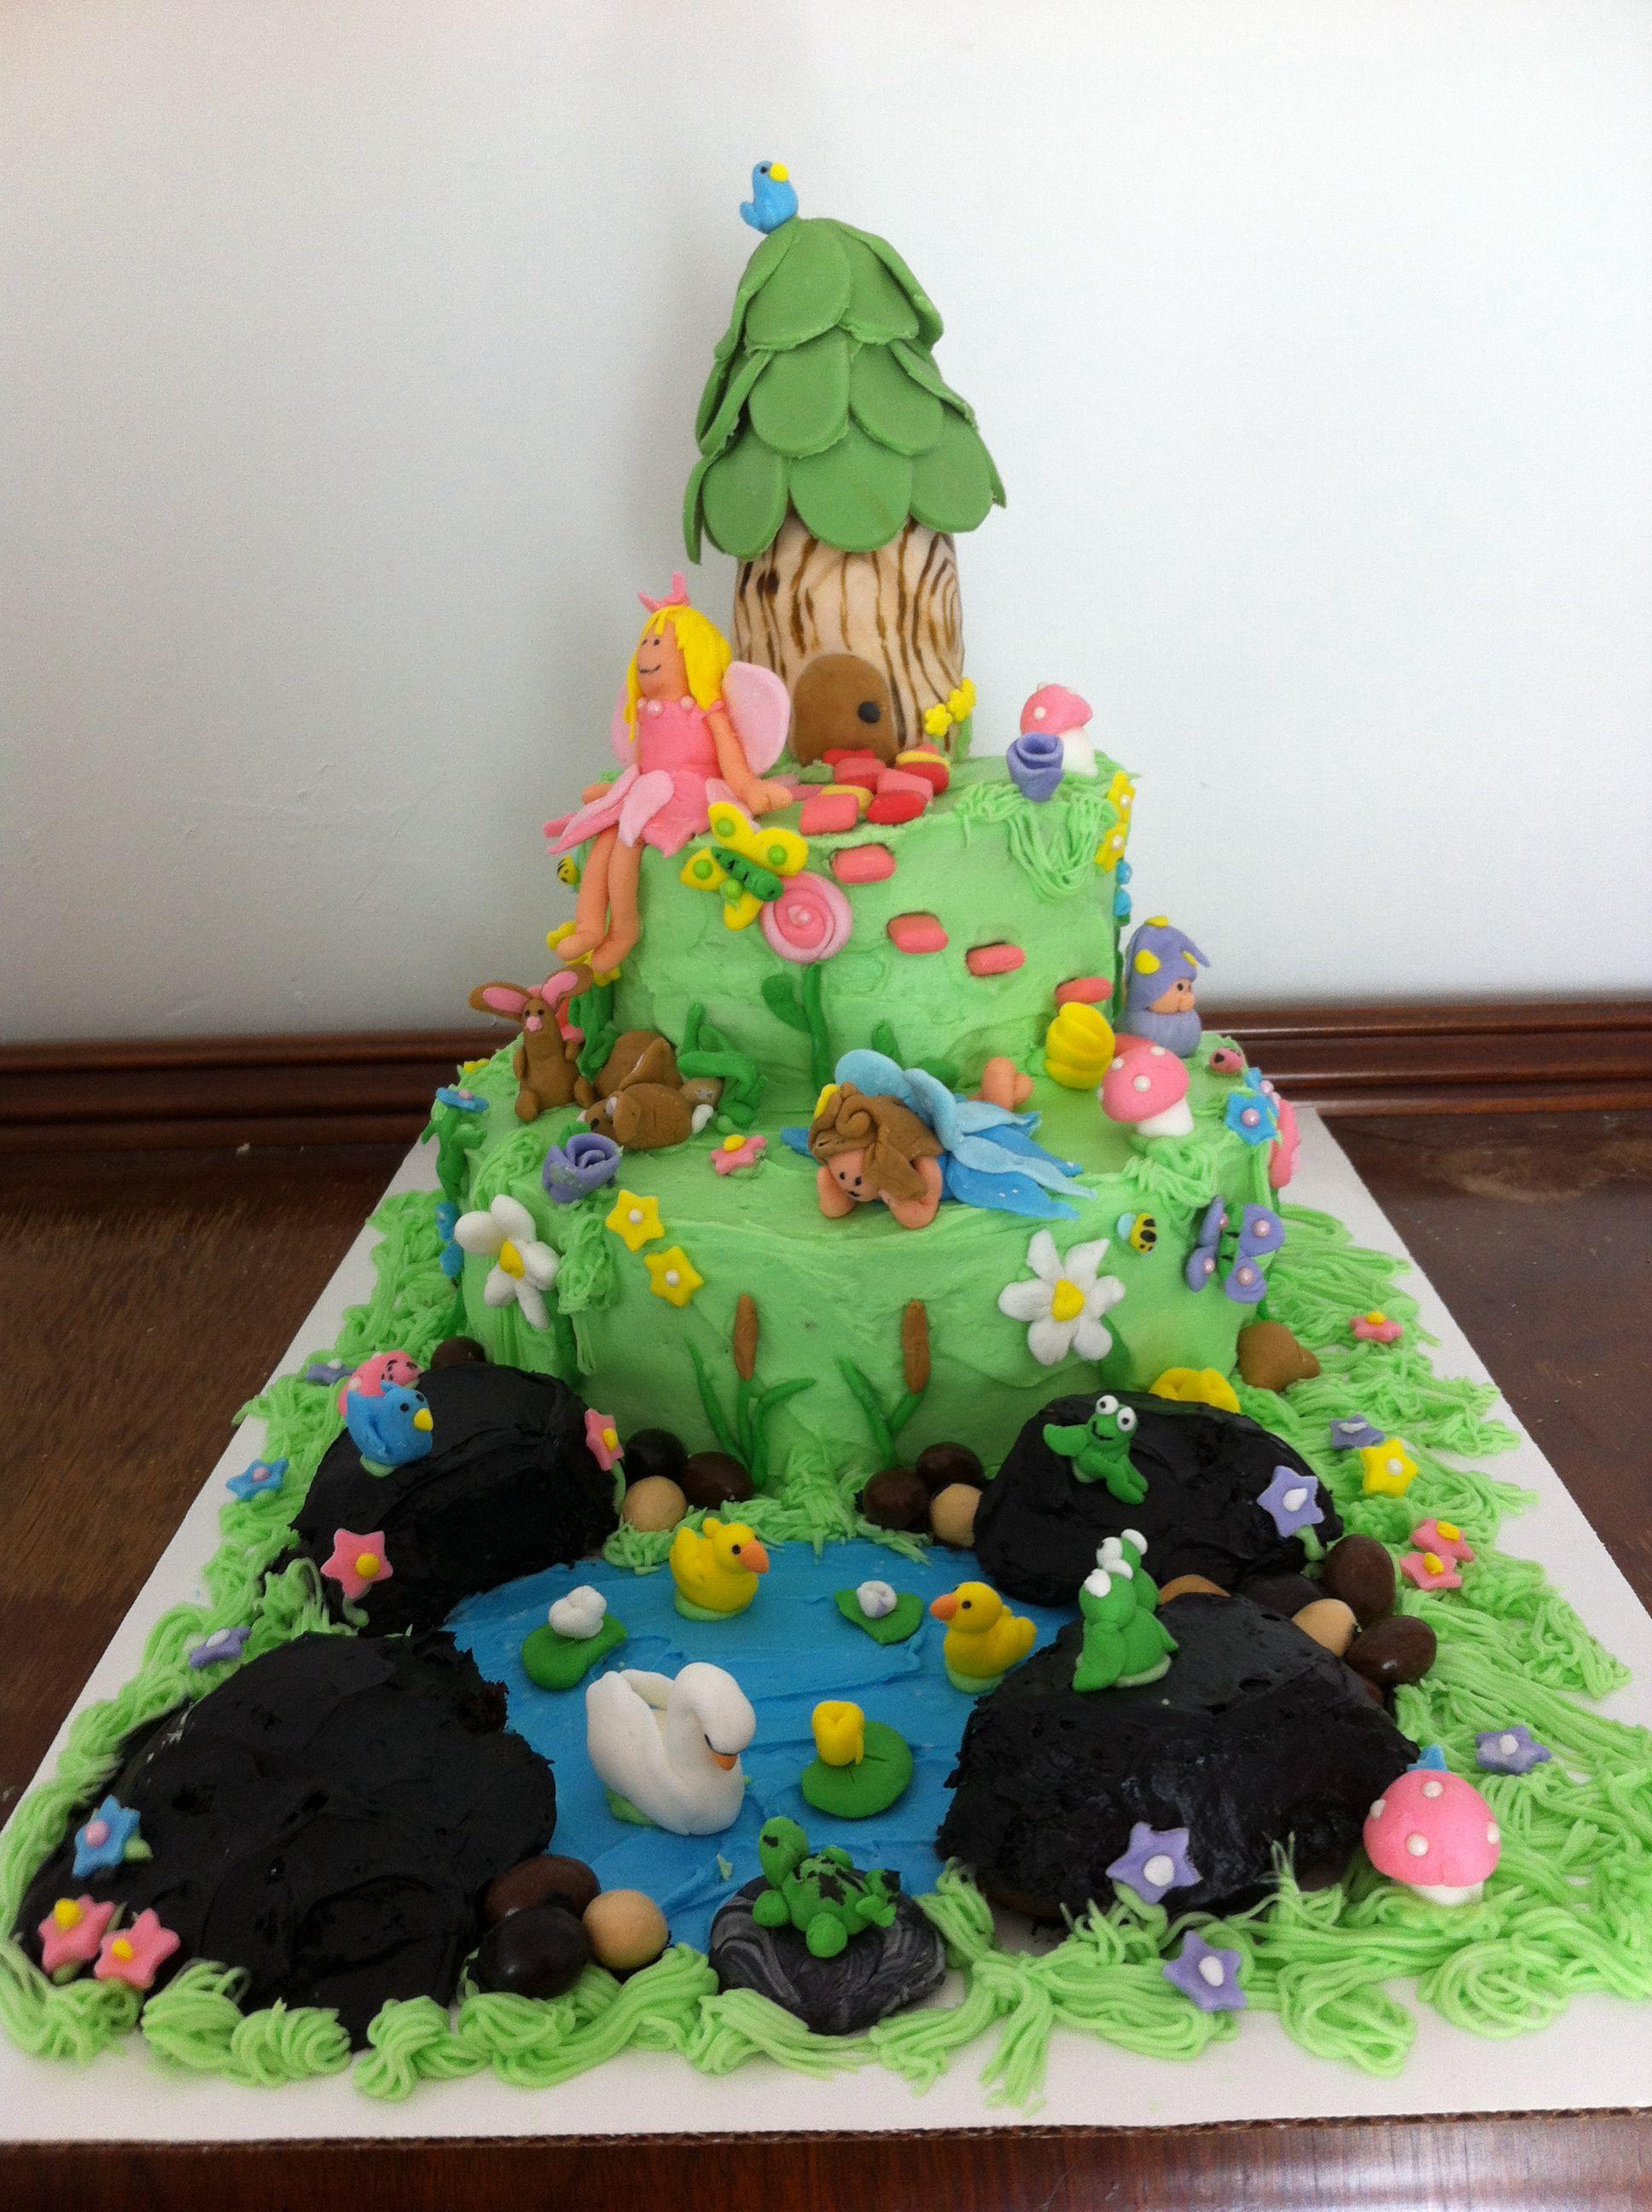 Fairy garden cake | Fairy garden cake, Garden cakes, Cake